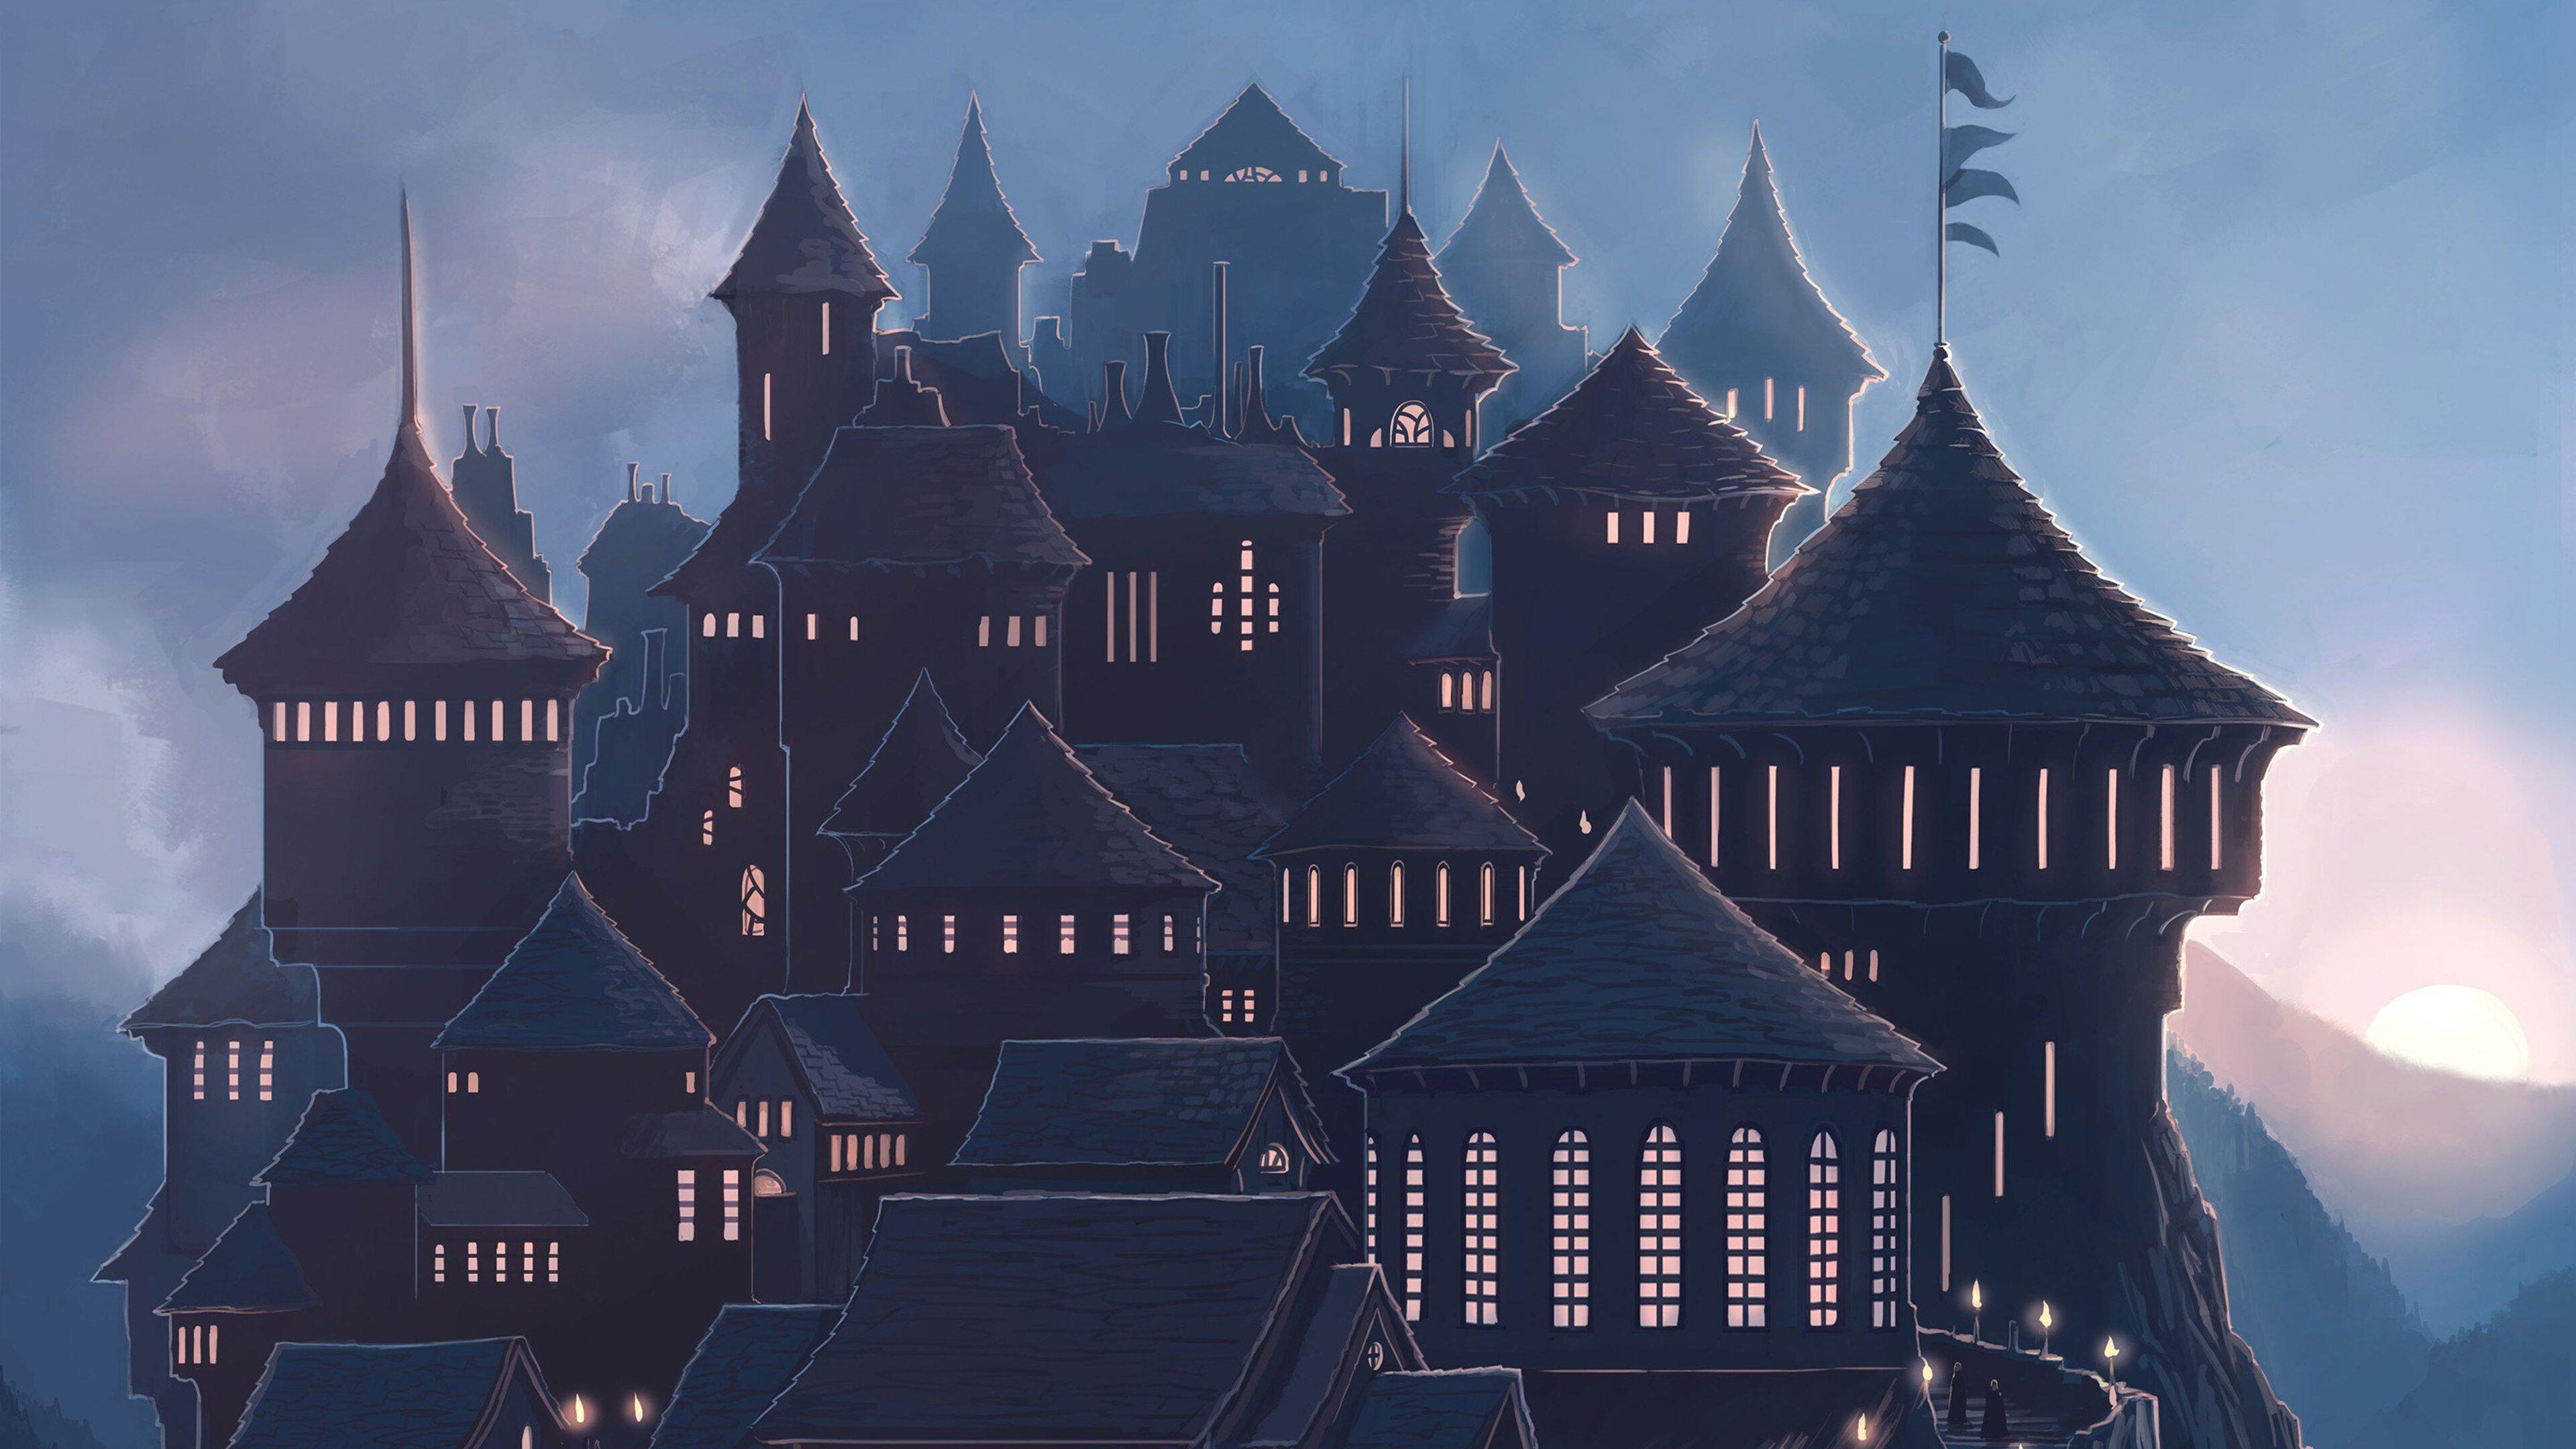 3840x2160 Hogwarts 4k HD 4k Wallpapers, Images ...